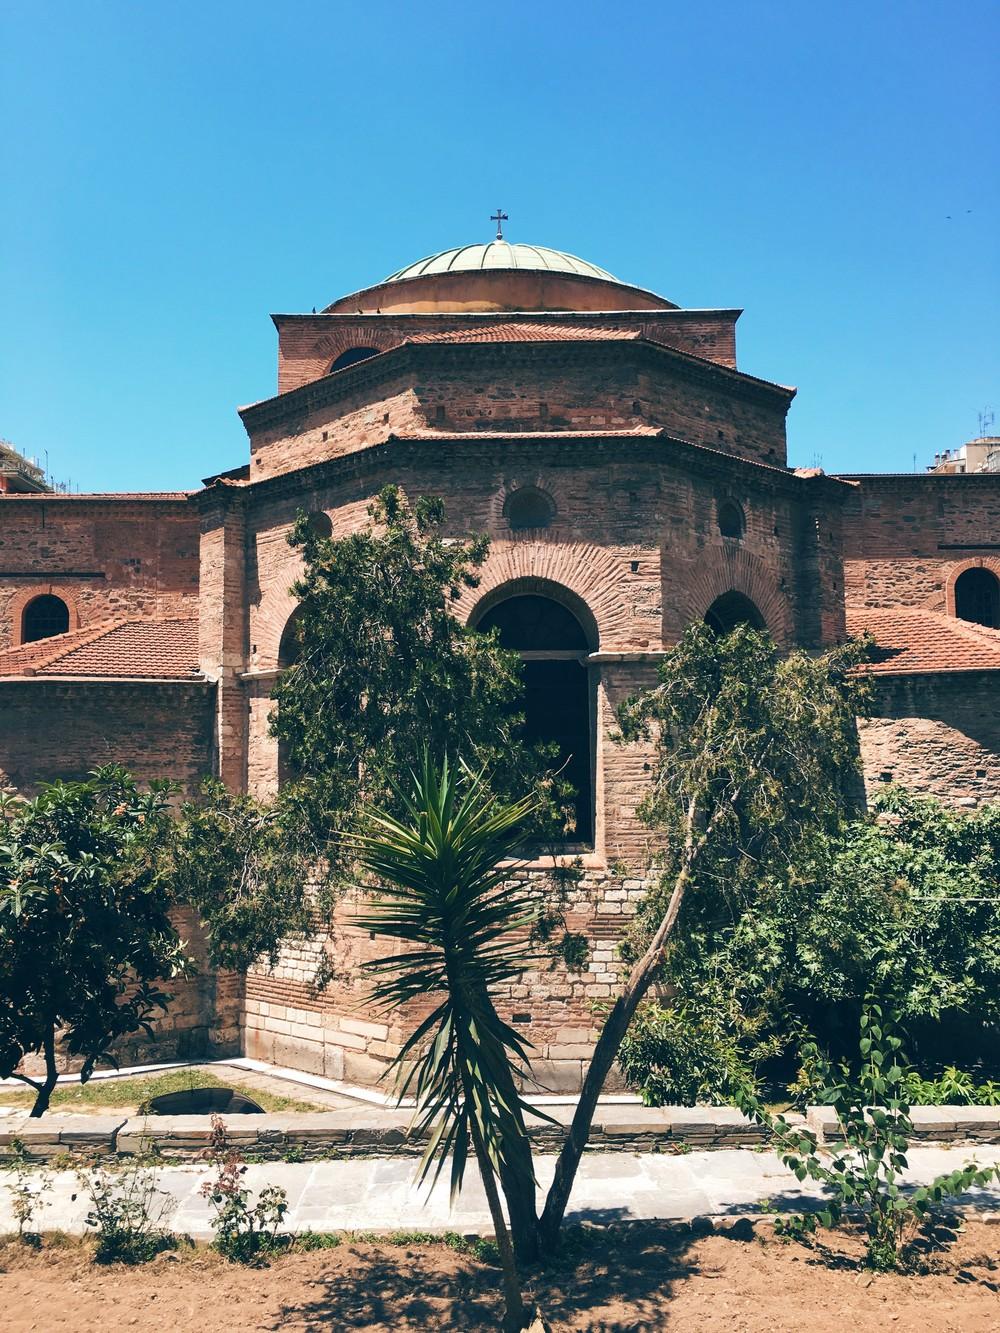 Back view of Agia Sofia church